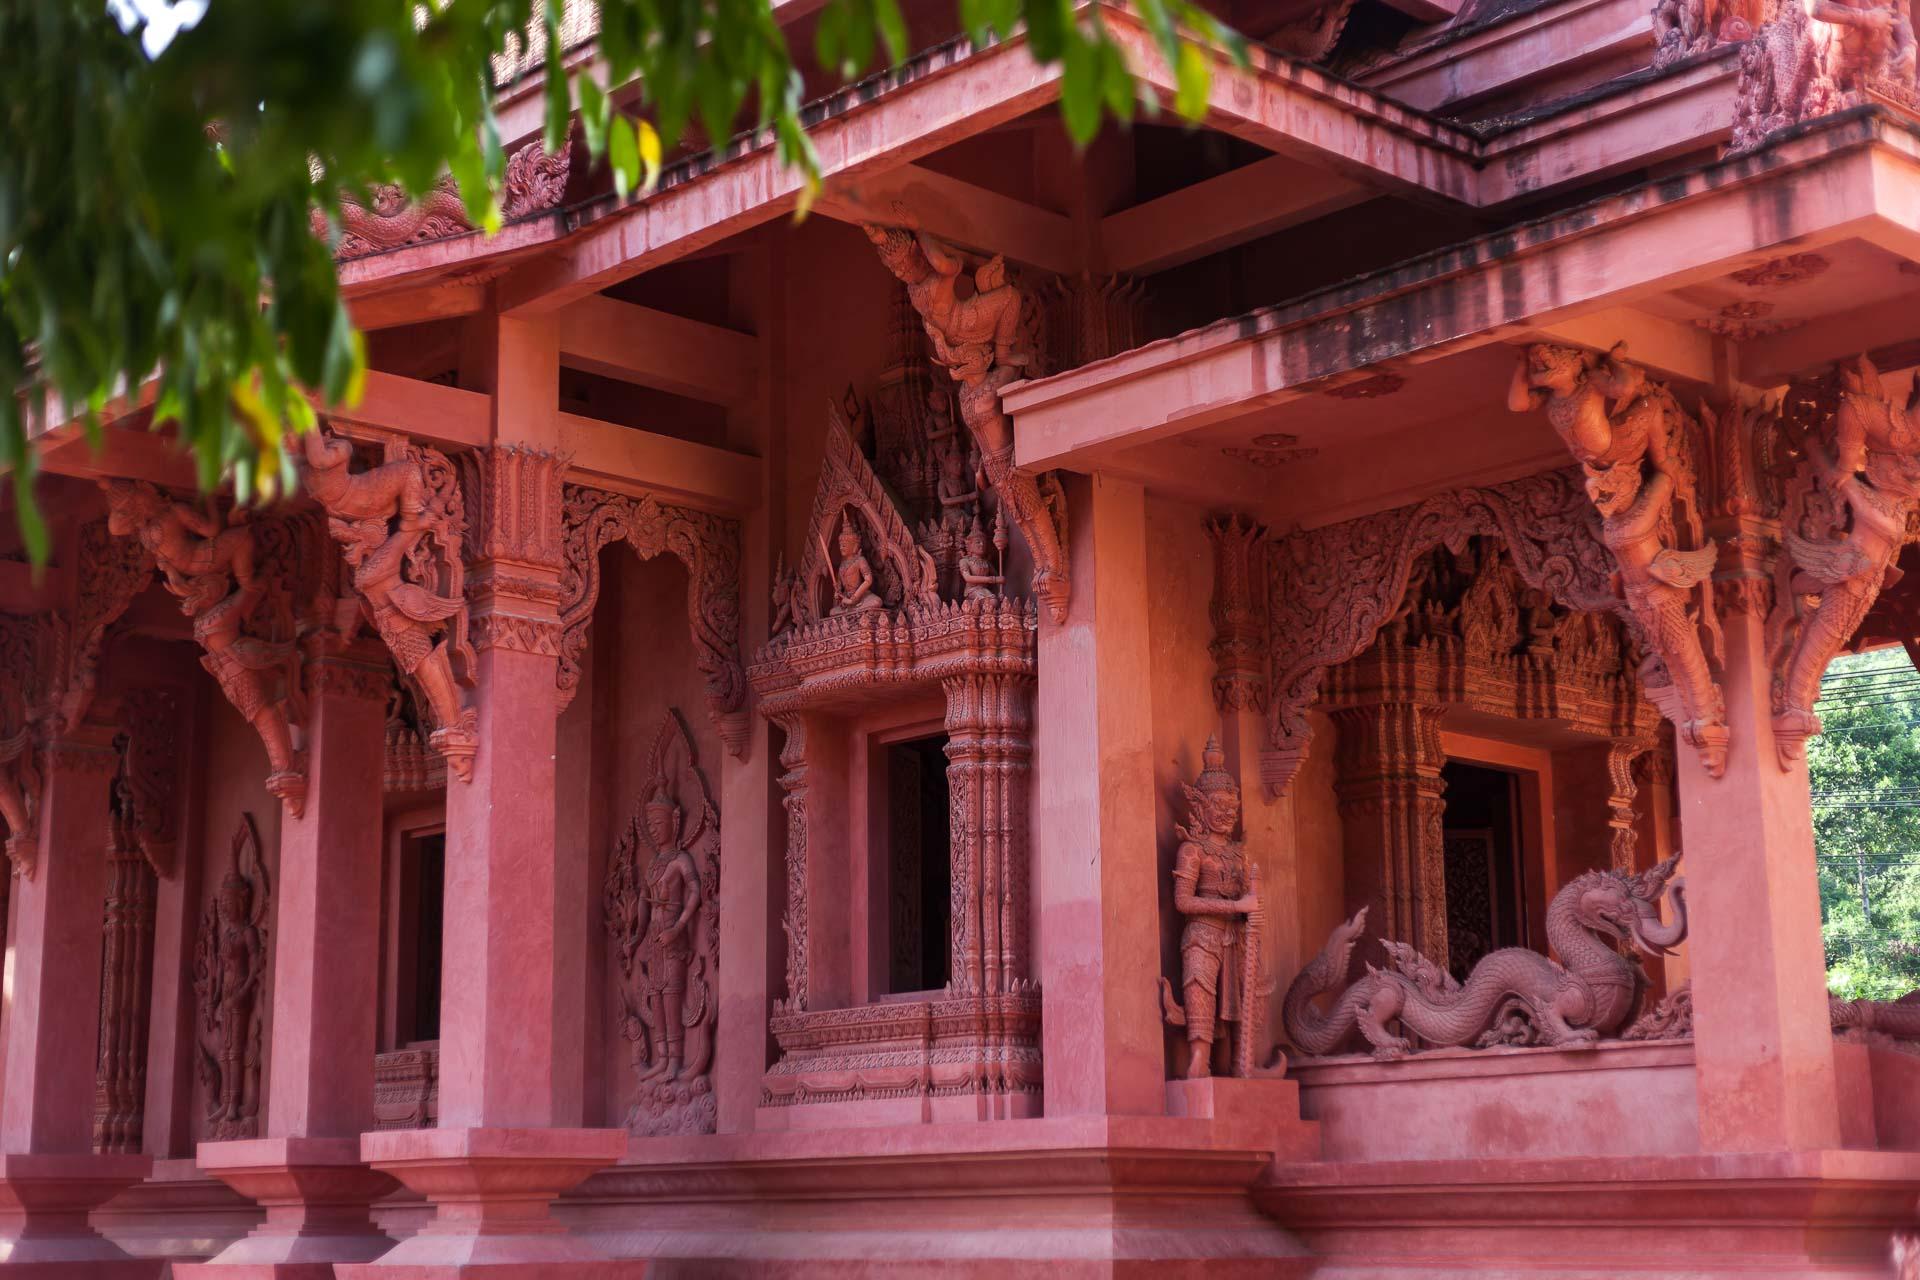 Красный храм, Терракотовый храм, храм из глины, буддизм, Ват Сила Нгу, Samui, Thailand,Waе Sila Ngu, Самуи, Таиланд